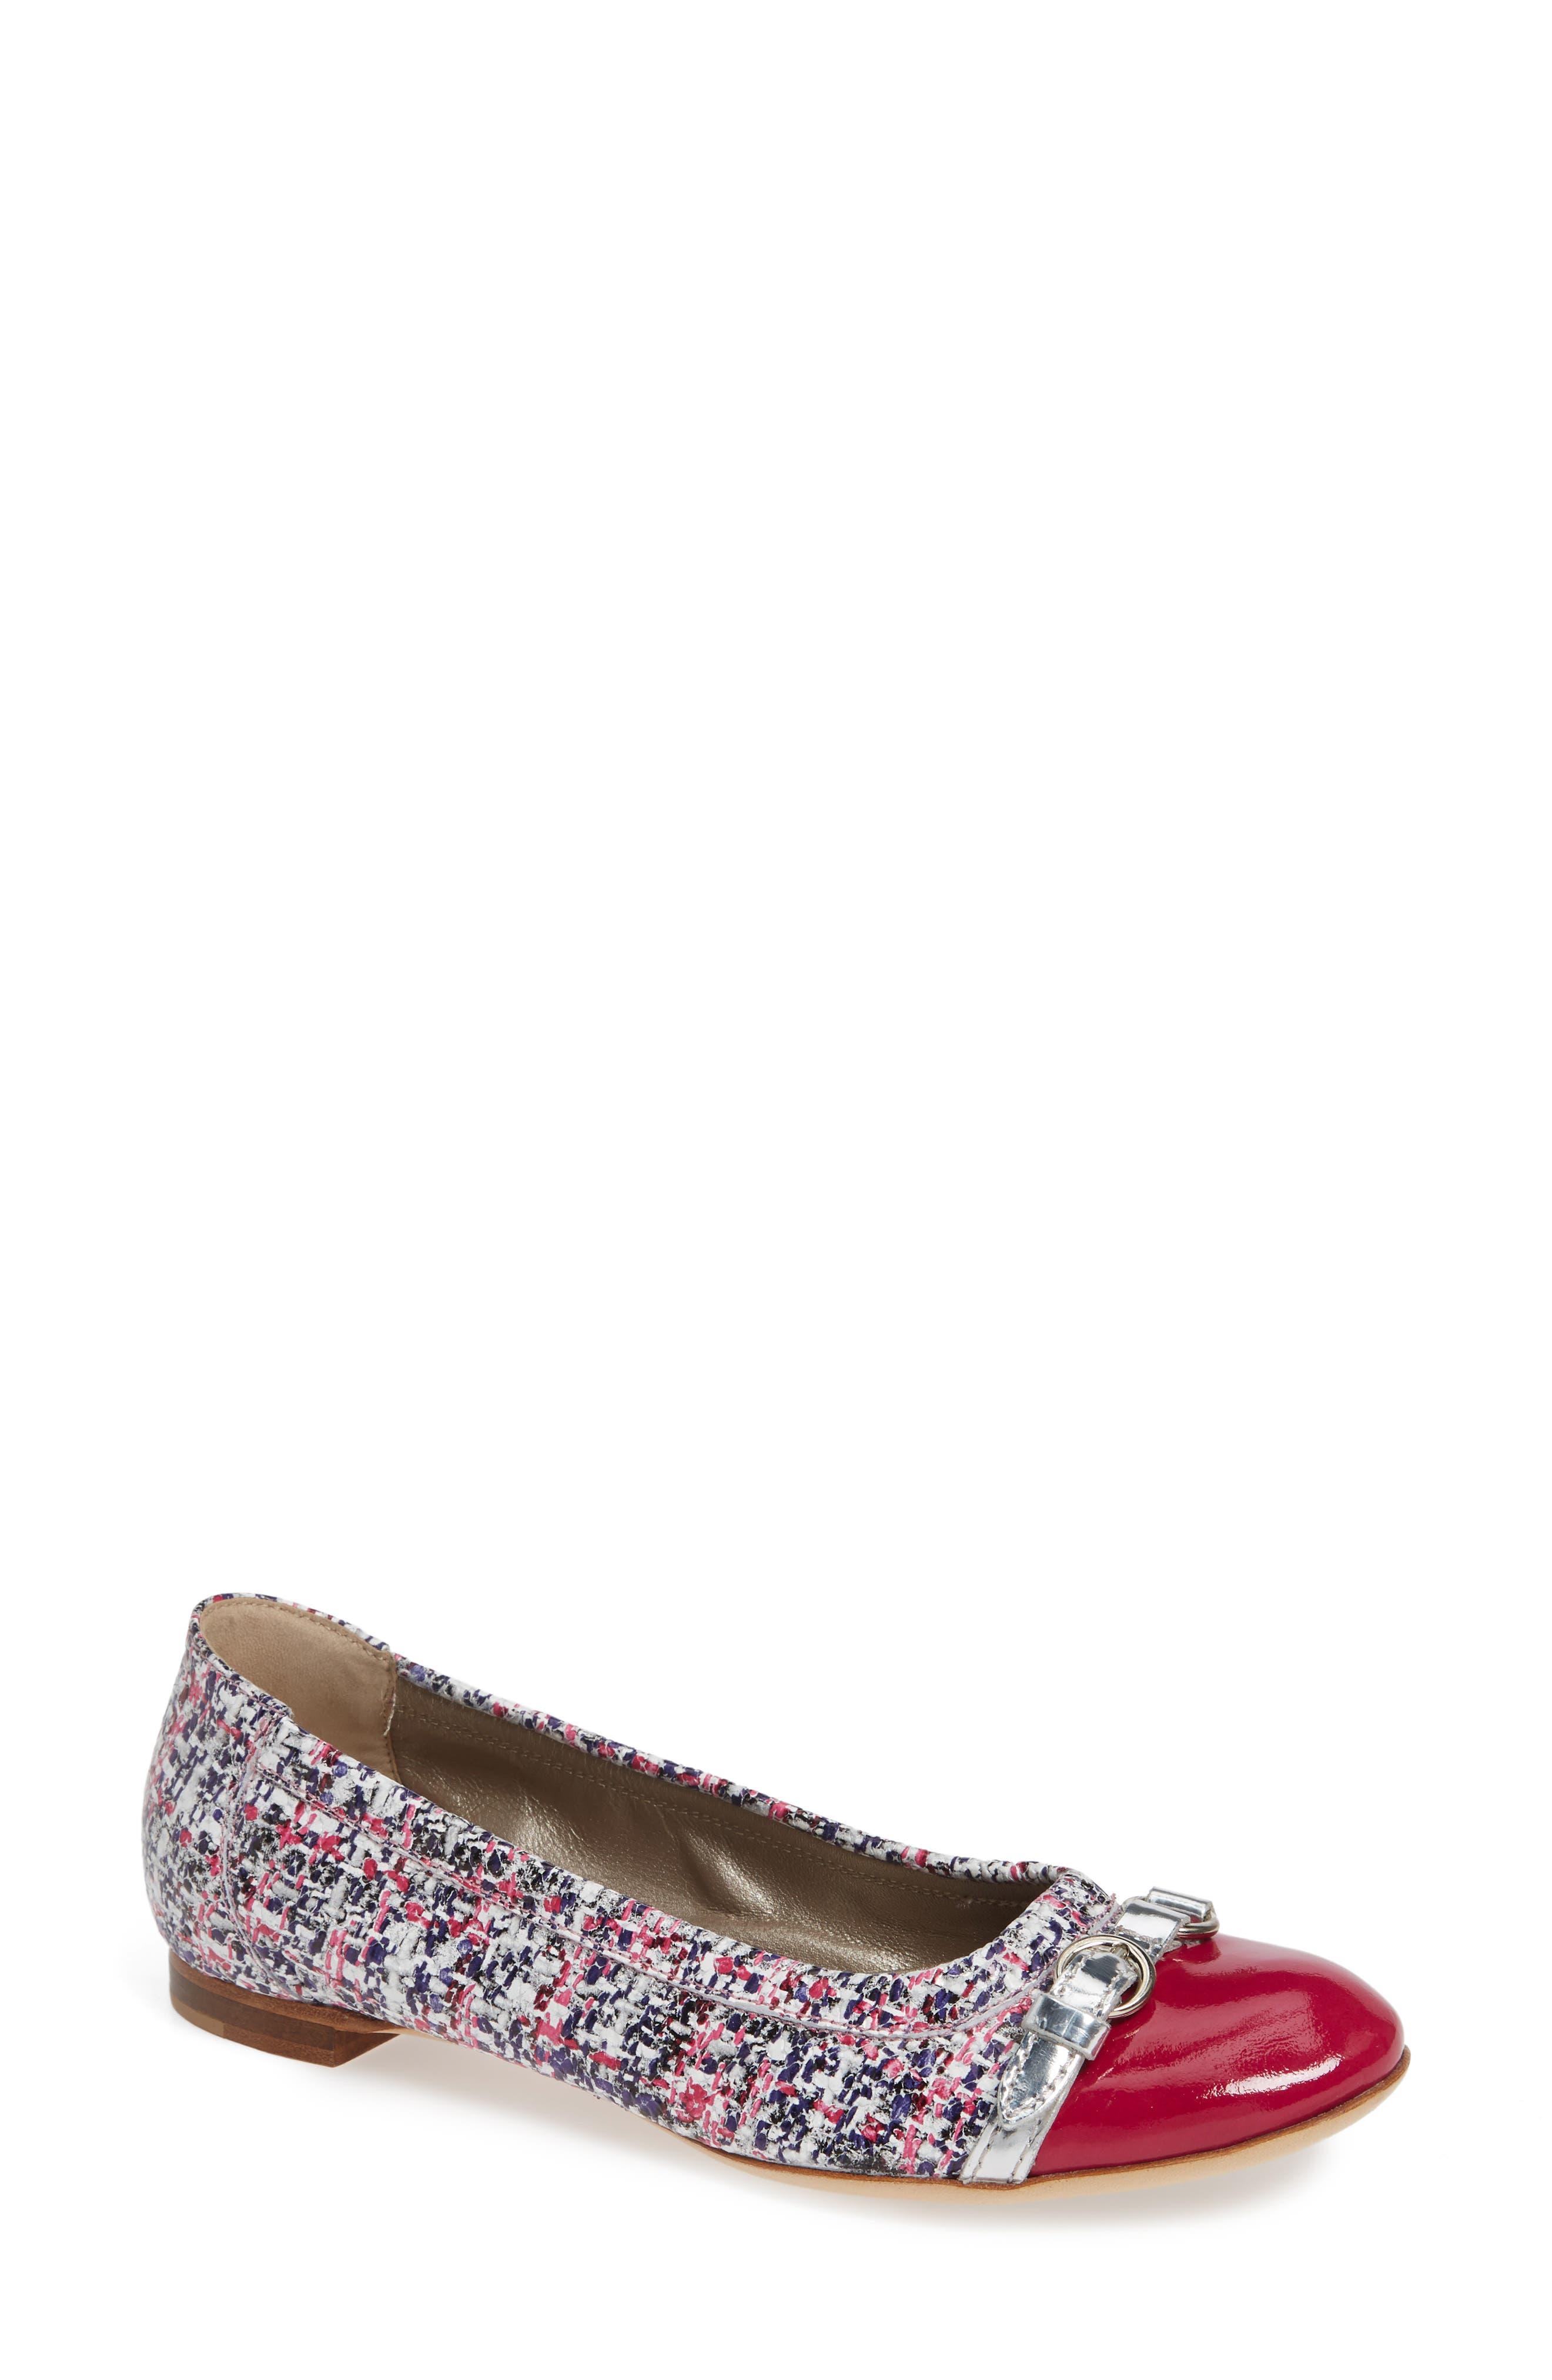 AGL ATTILIO GIUSTI LEOMBRUNI Cap Toe Ballet Flat in Pink Tweed Print